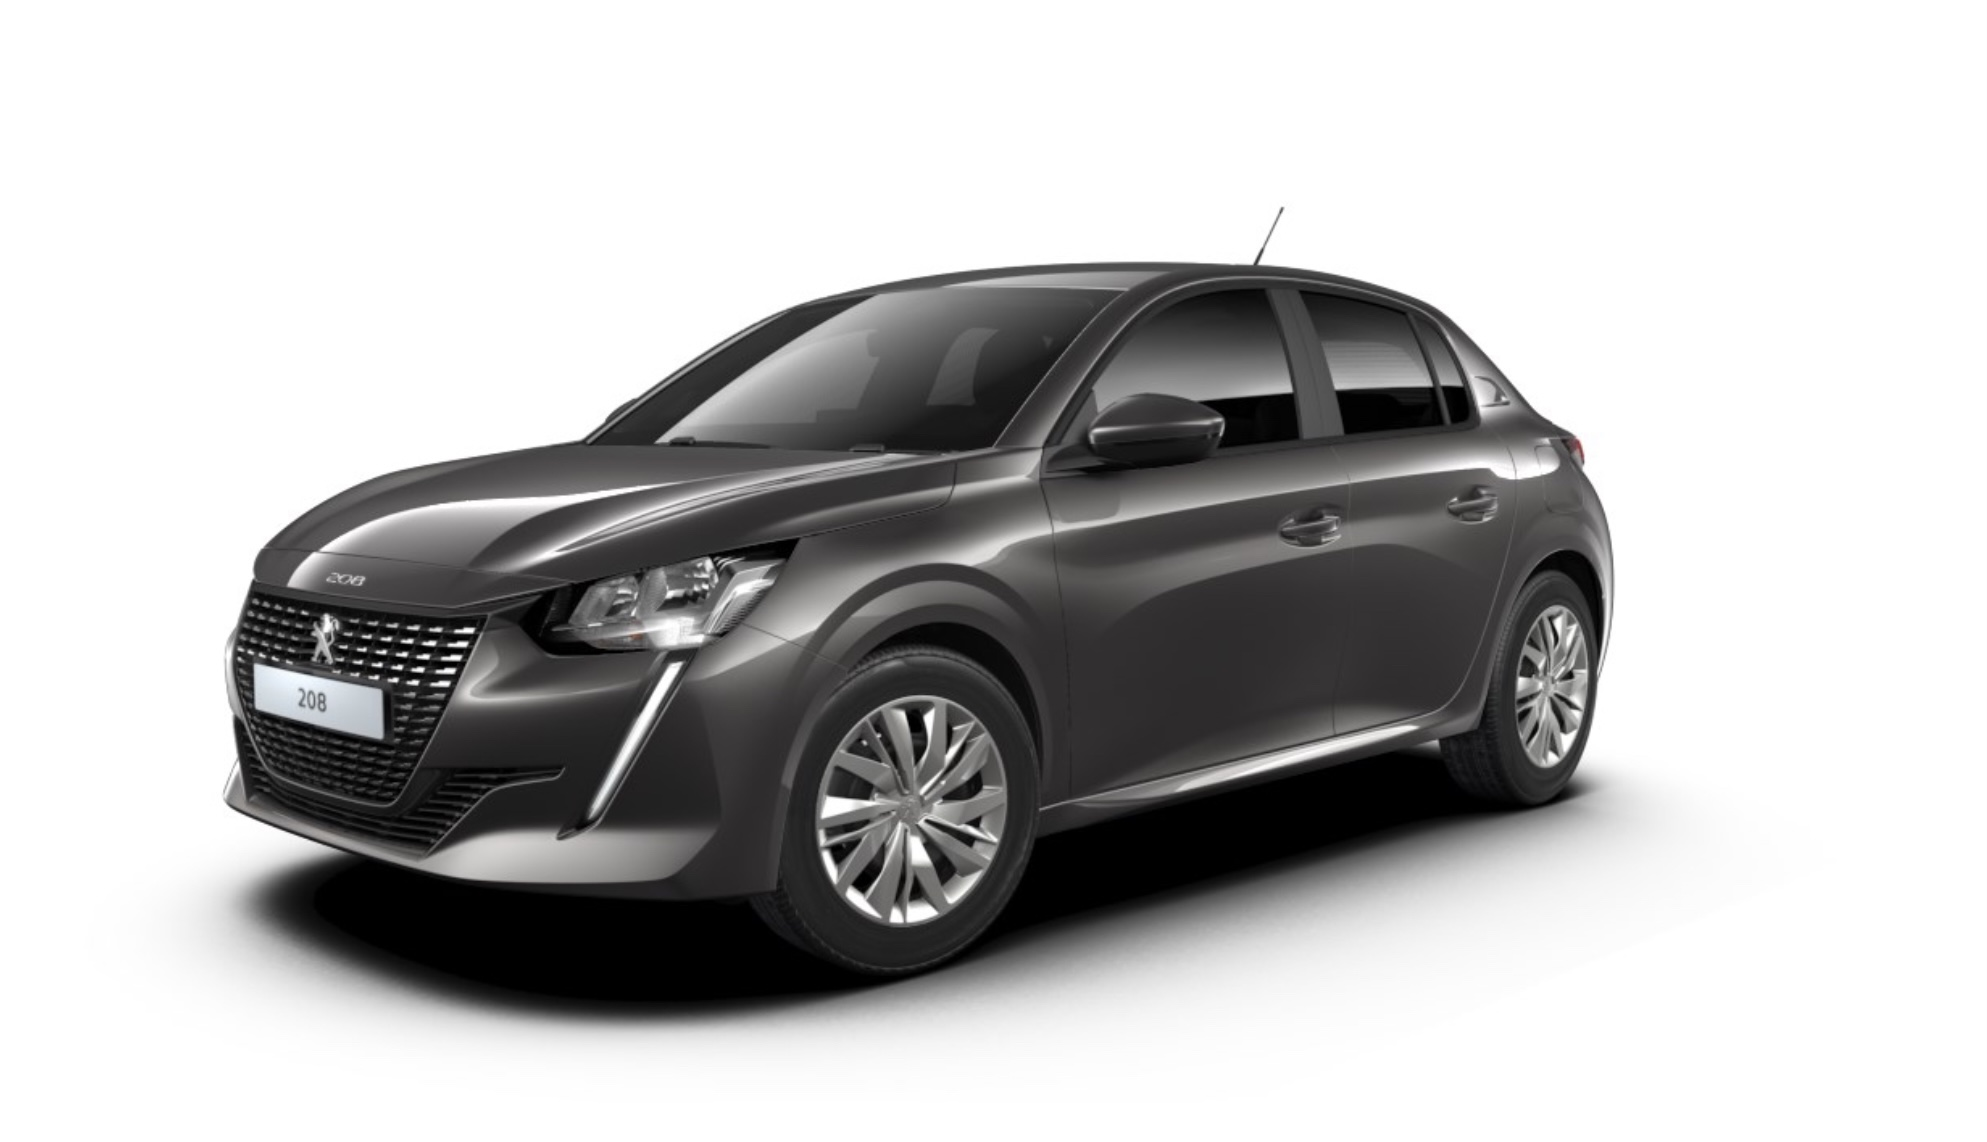 Peugeot 208 354.00 image